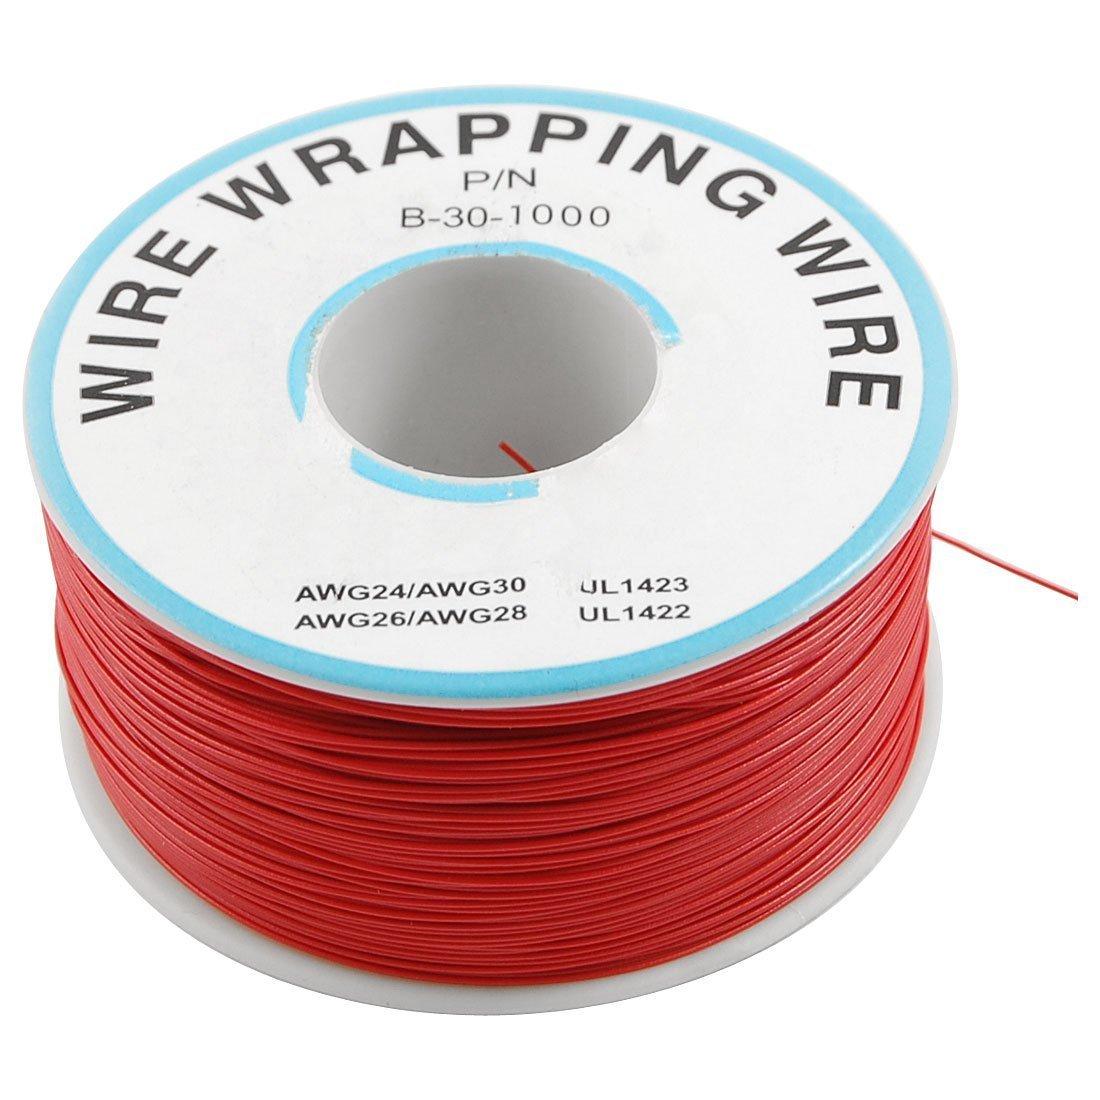 PCB Solder 0,25 mm Verzinnter Kupfer Kordel Dia wire-wrapping Draht ...